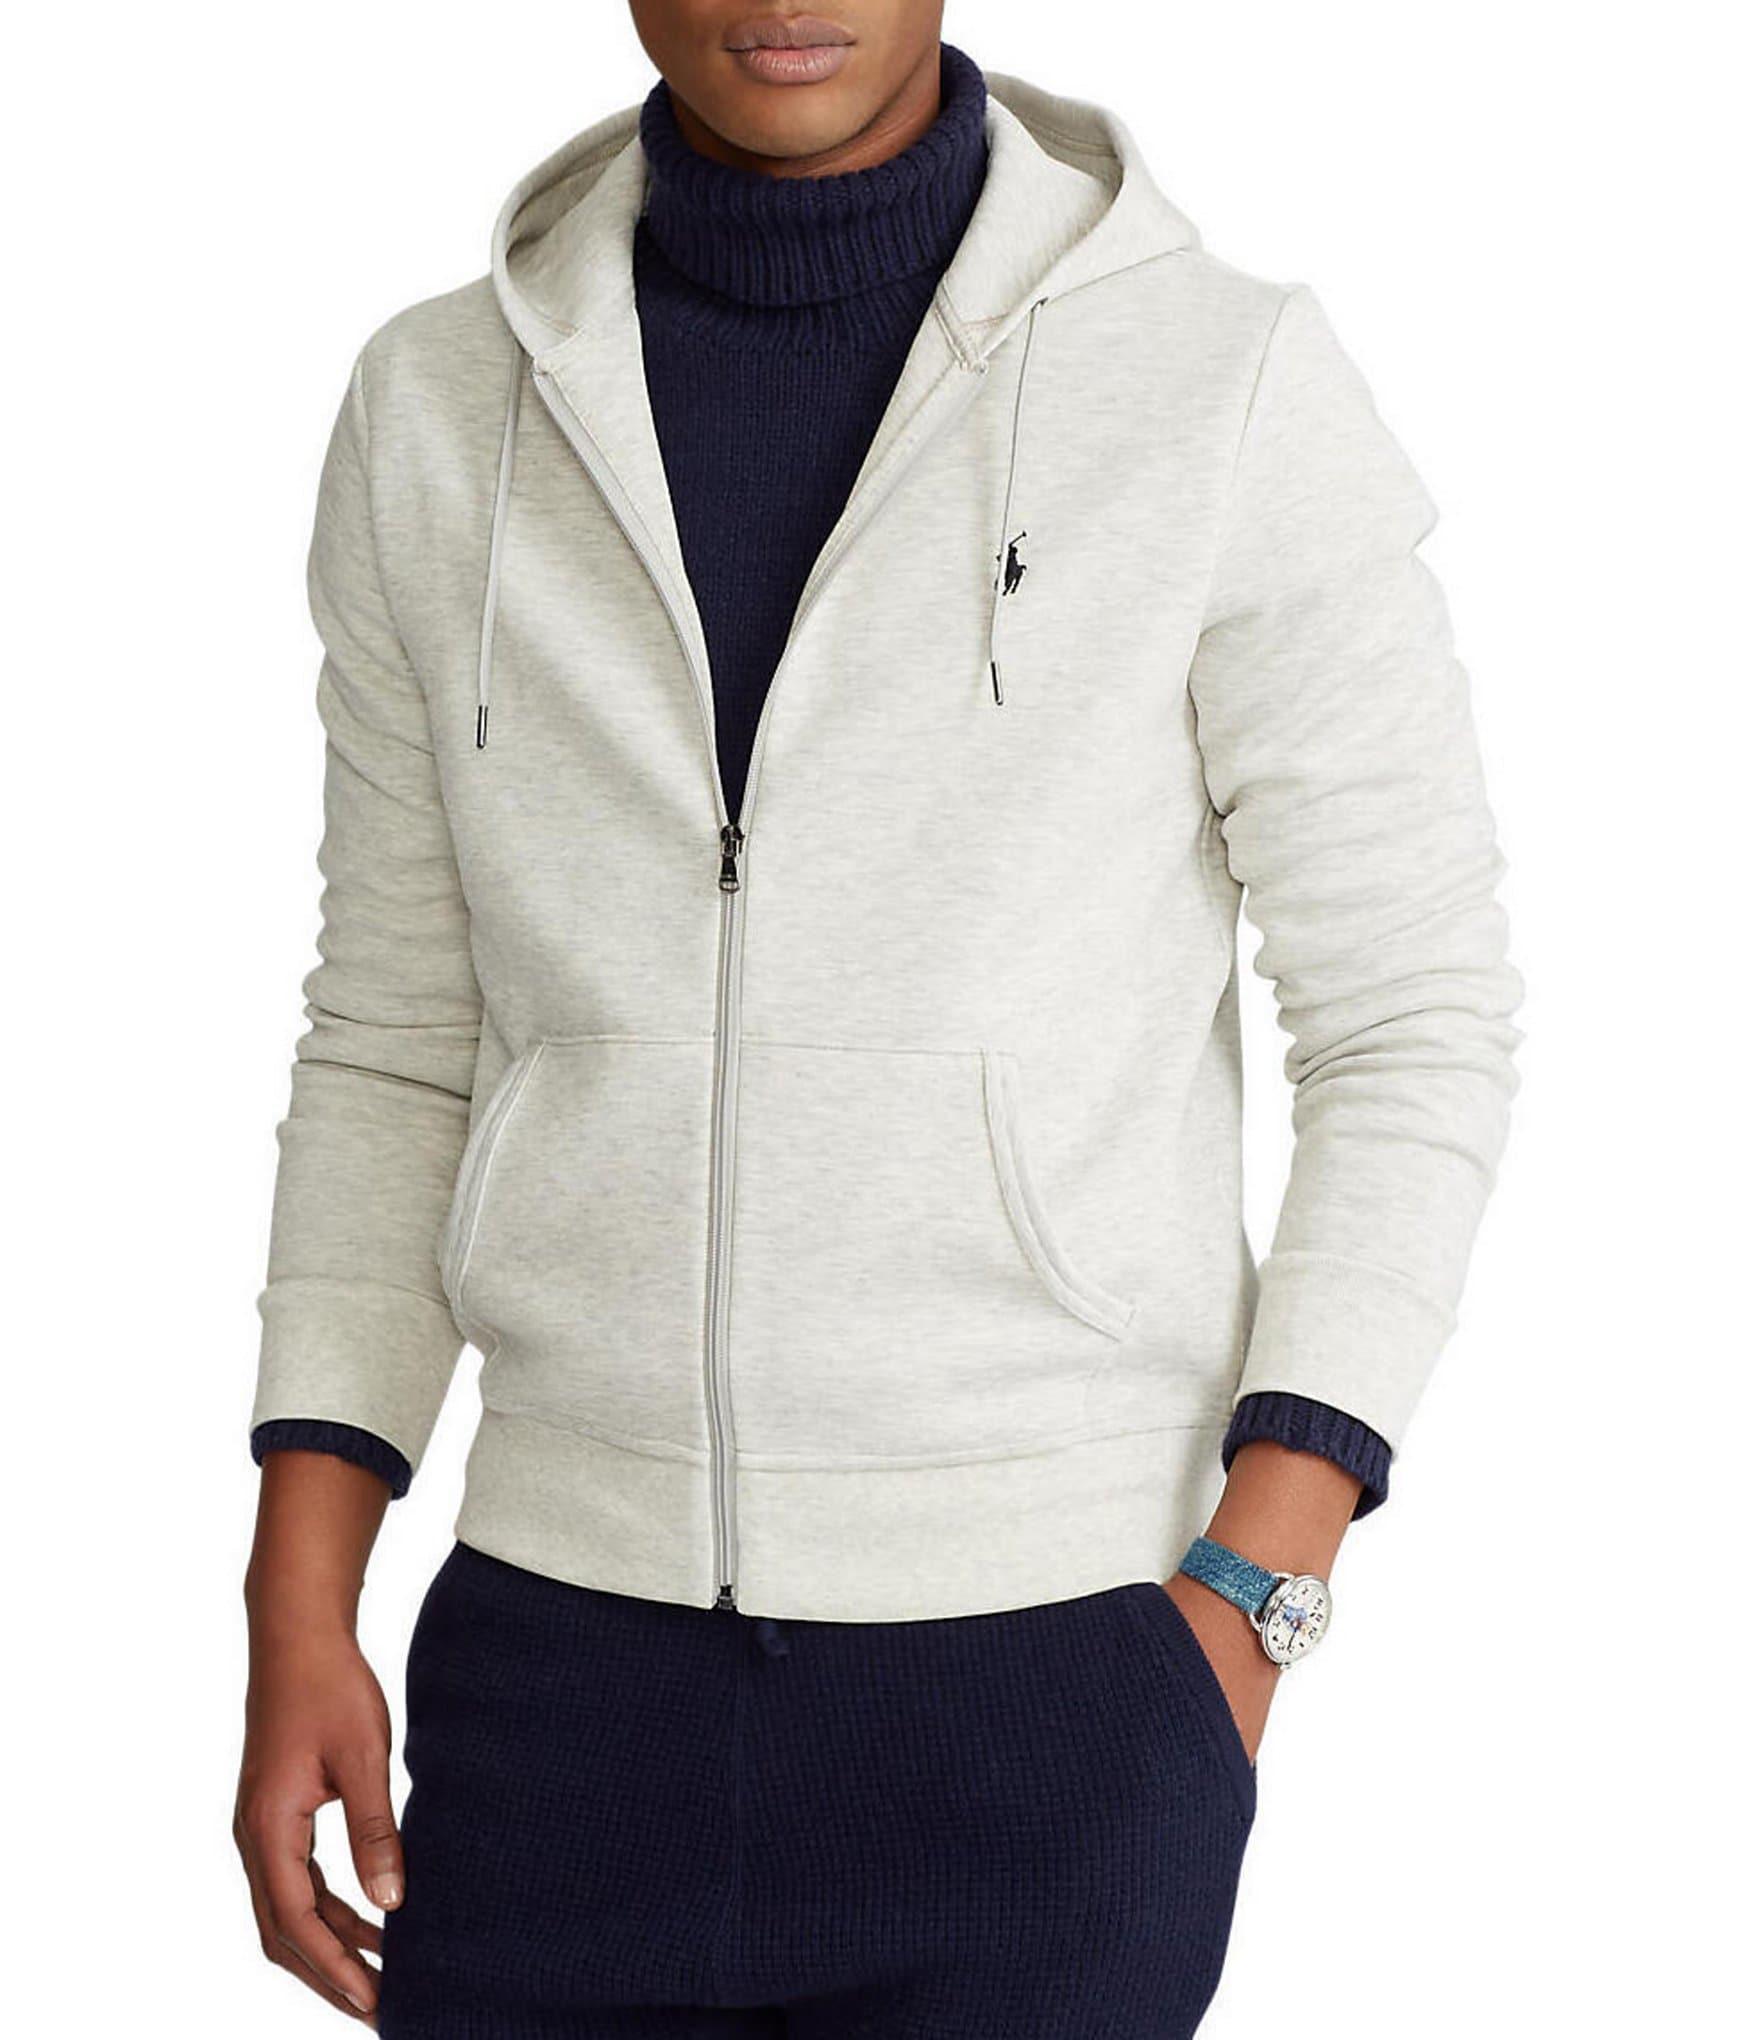 b3350bcc432 Polo Ralph Lauren Double-Knit Full-Zip Hoodie